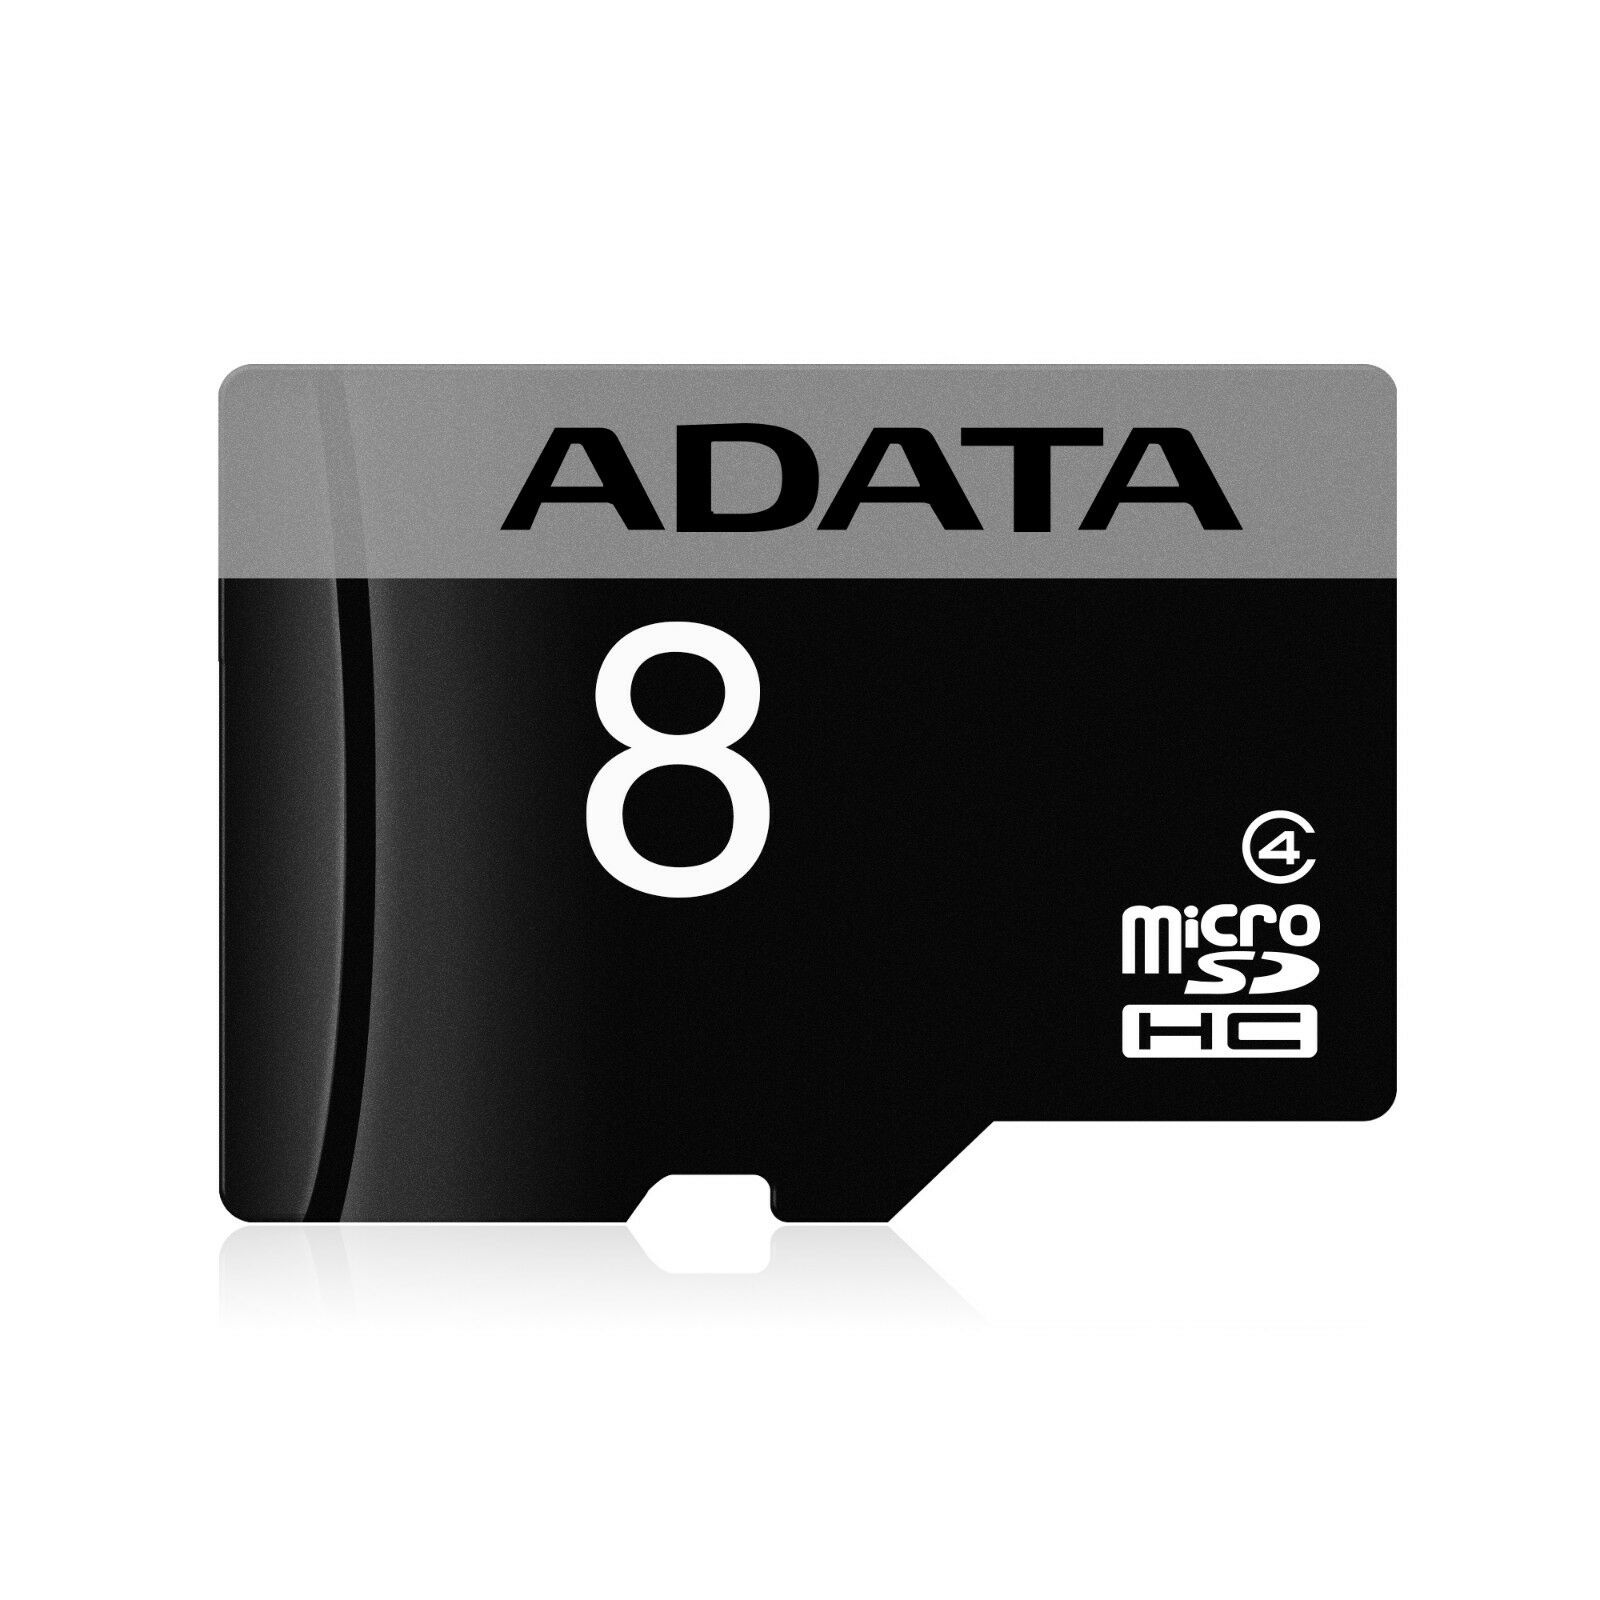 4GB 8GB 16GB 32GB MicroSD Micro SD HC Class 4 TF Flash SDHC Memory Card Android